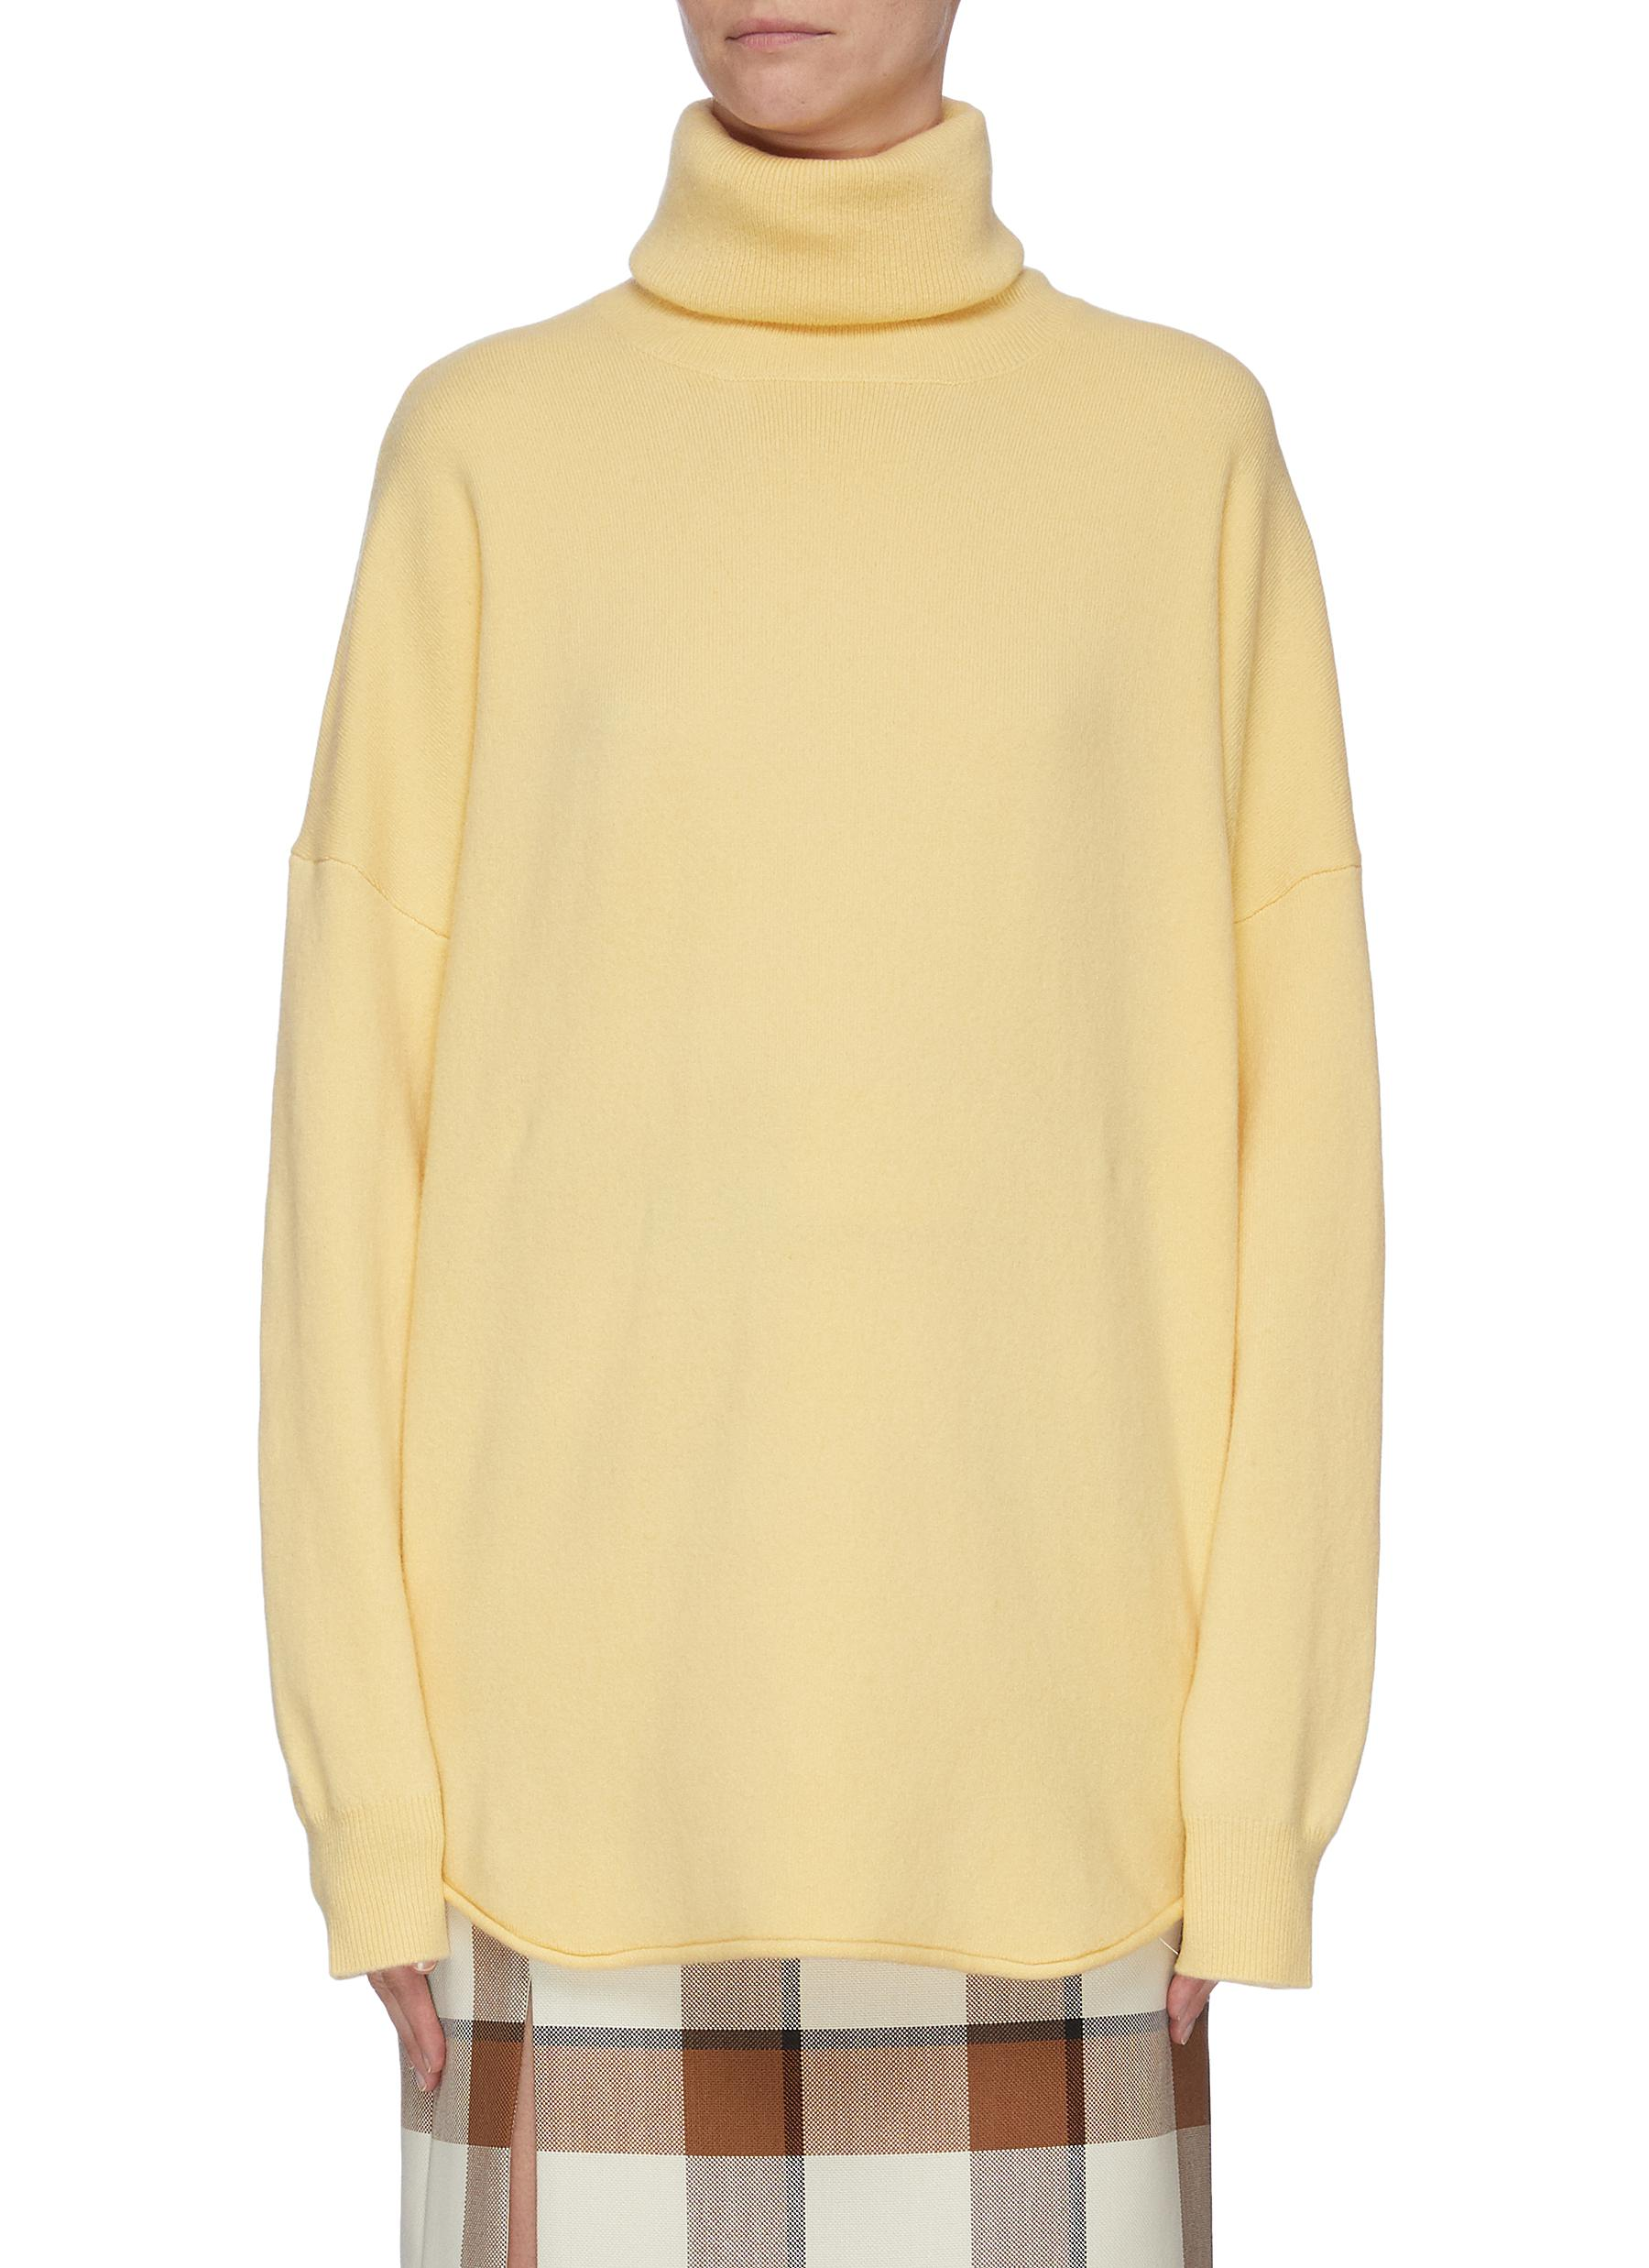 shop Extreme Cashmere Puff sleeve cashmere blend turtleneck knit top online